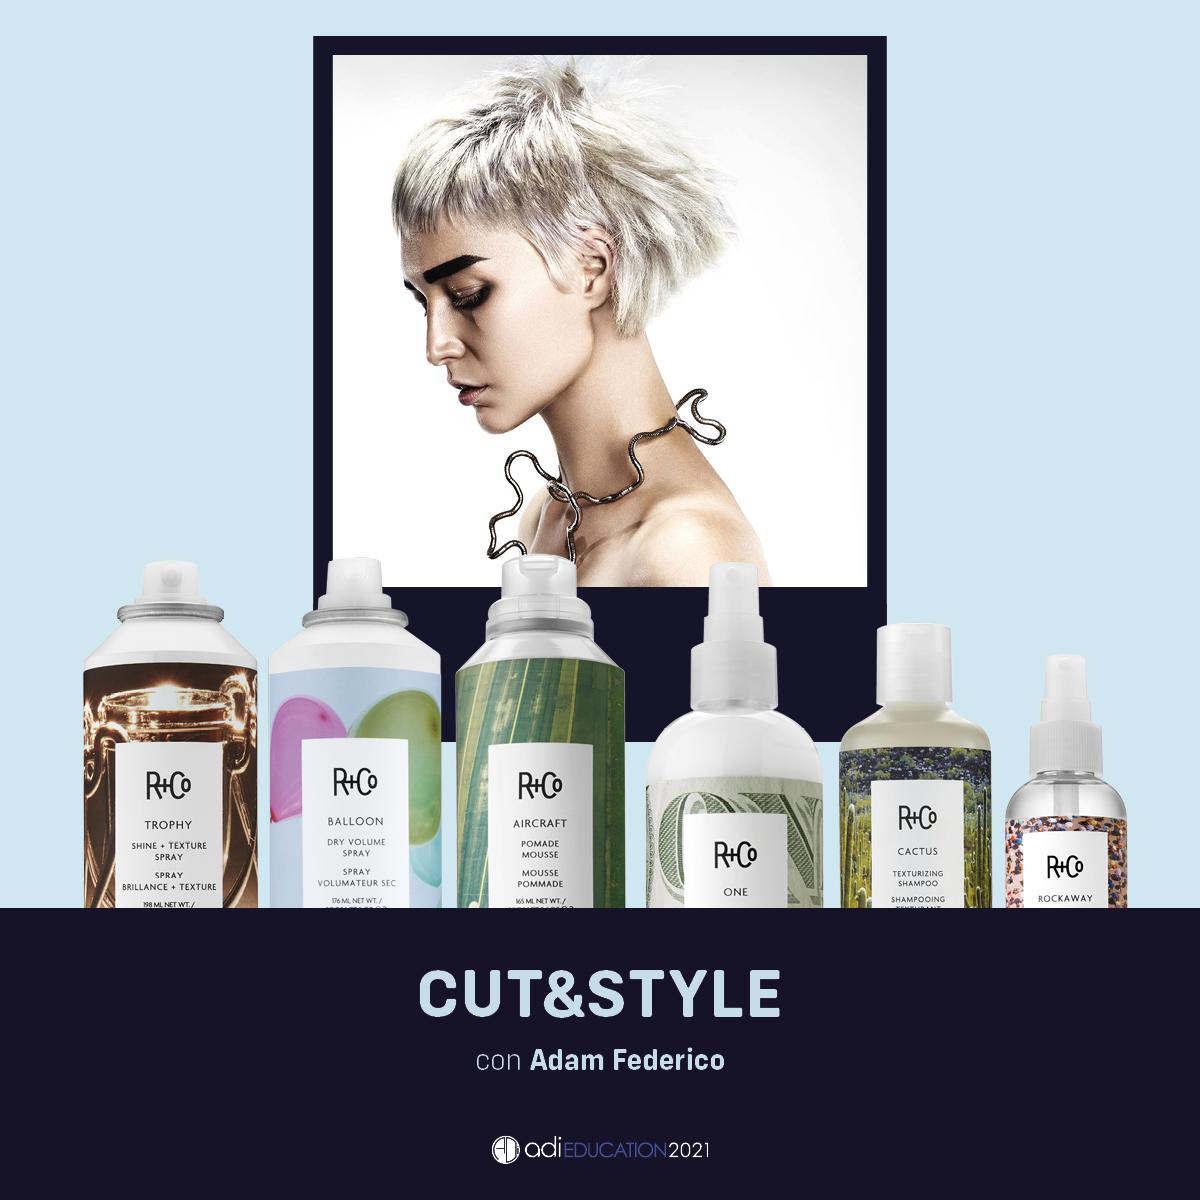 R+Co Stylist Kit + Eclass con Adam Federico 22 Marzo